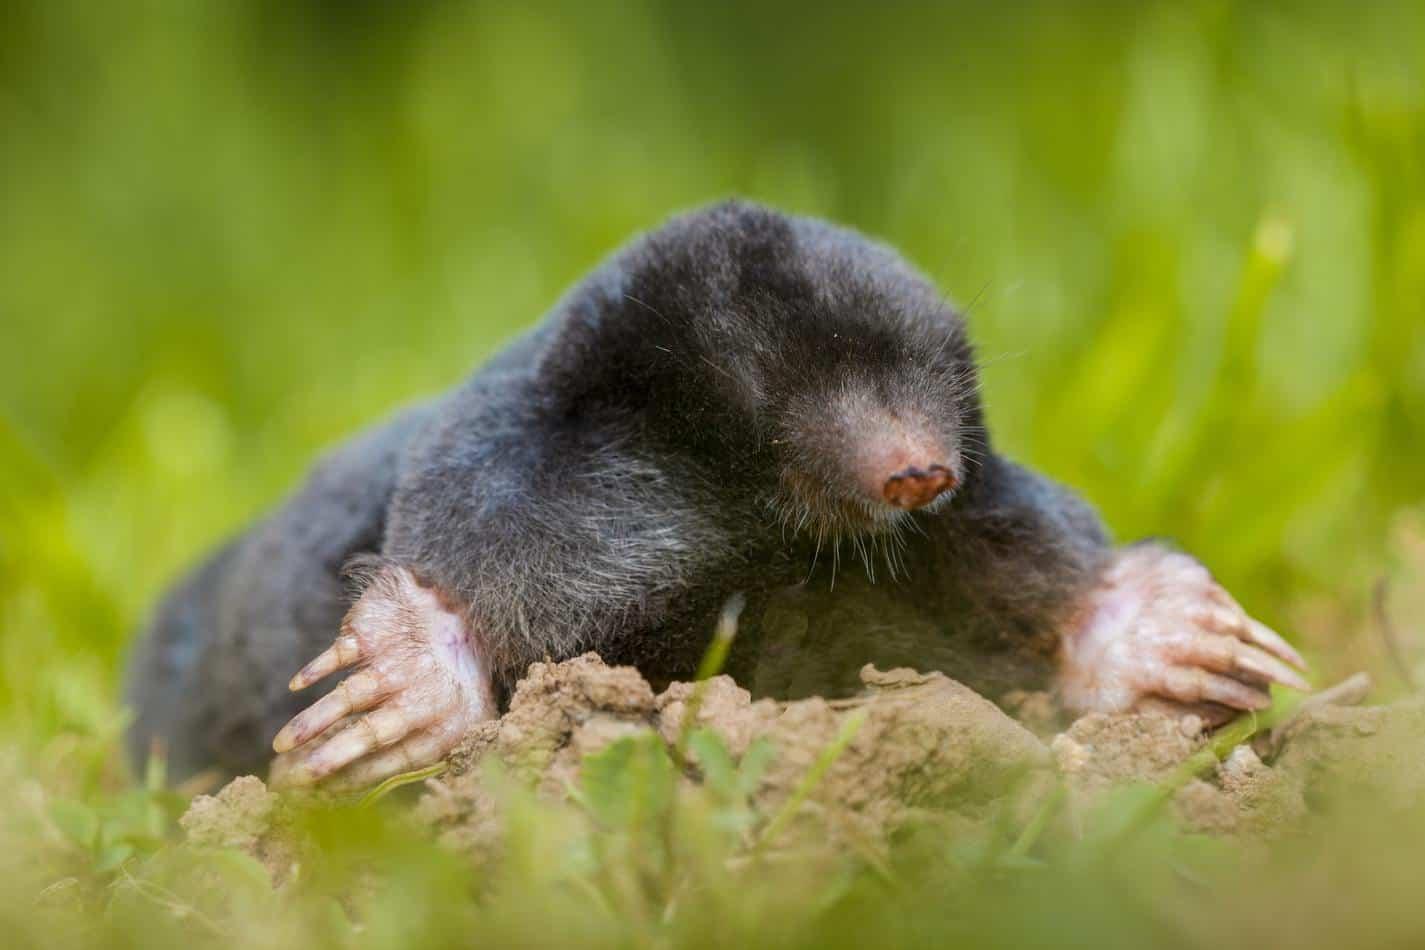 Wild Mole (Talpa europaea) in Natural Habitat